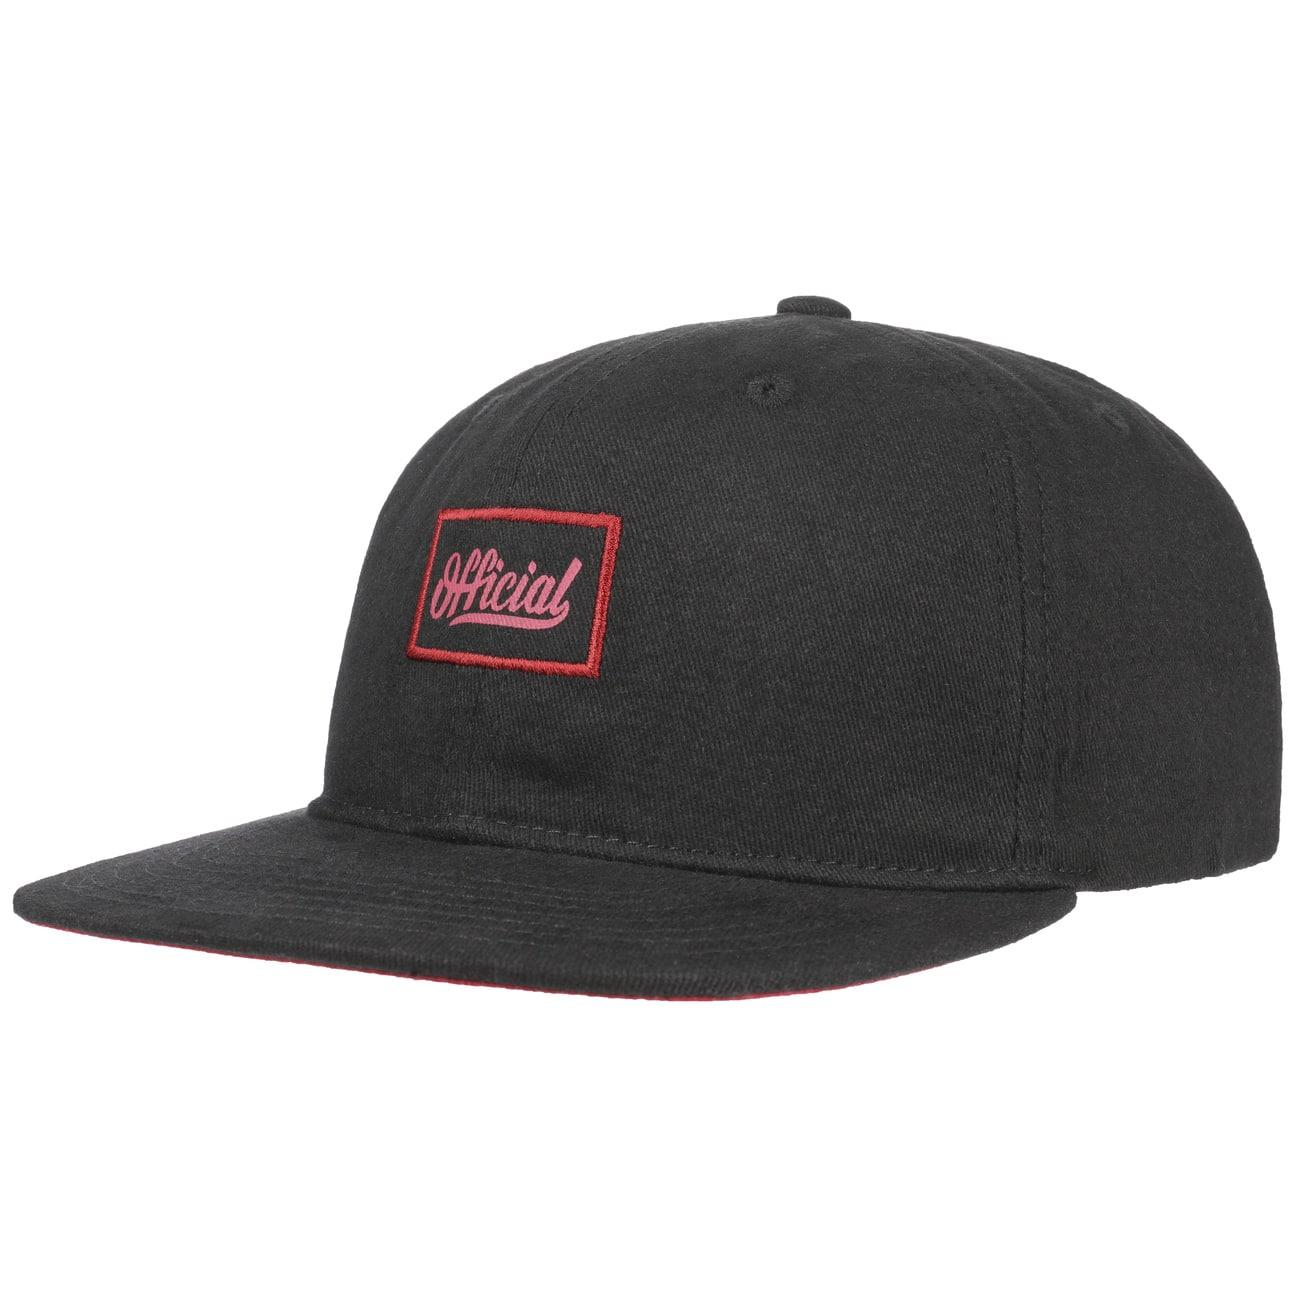 Casquette Yardie Snapback by Official Headwear  baseball cap